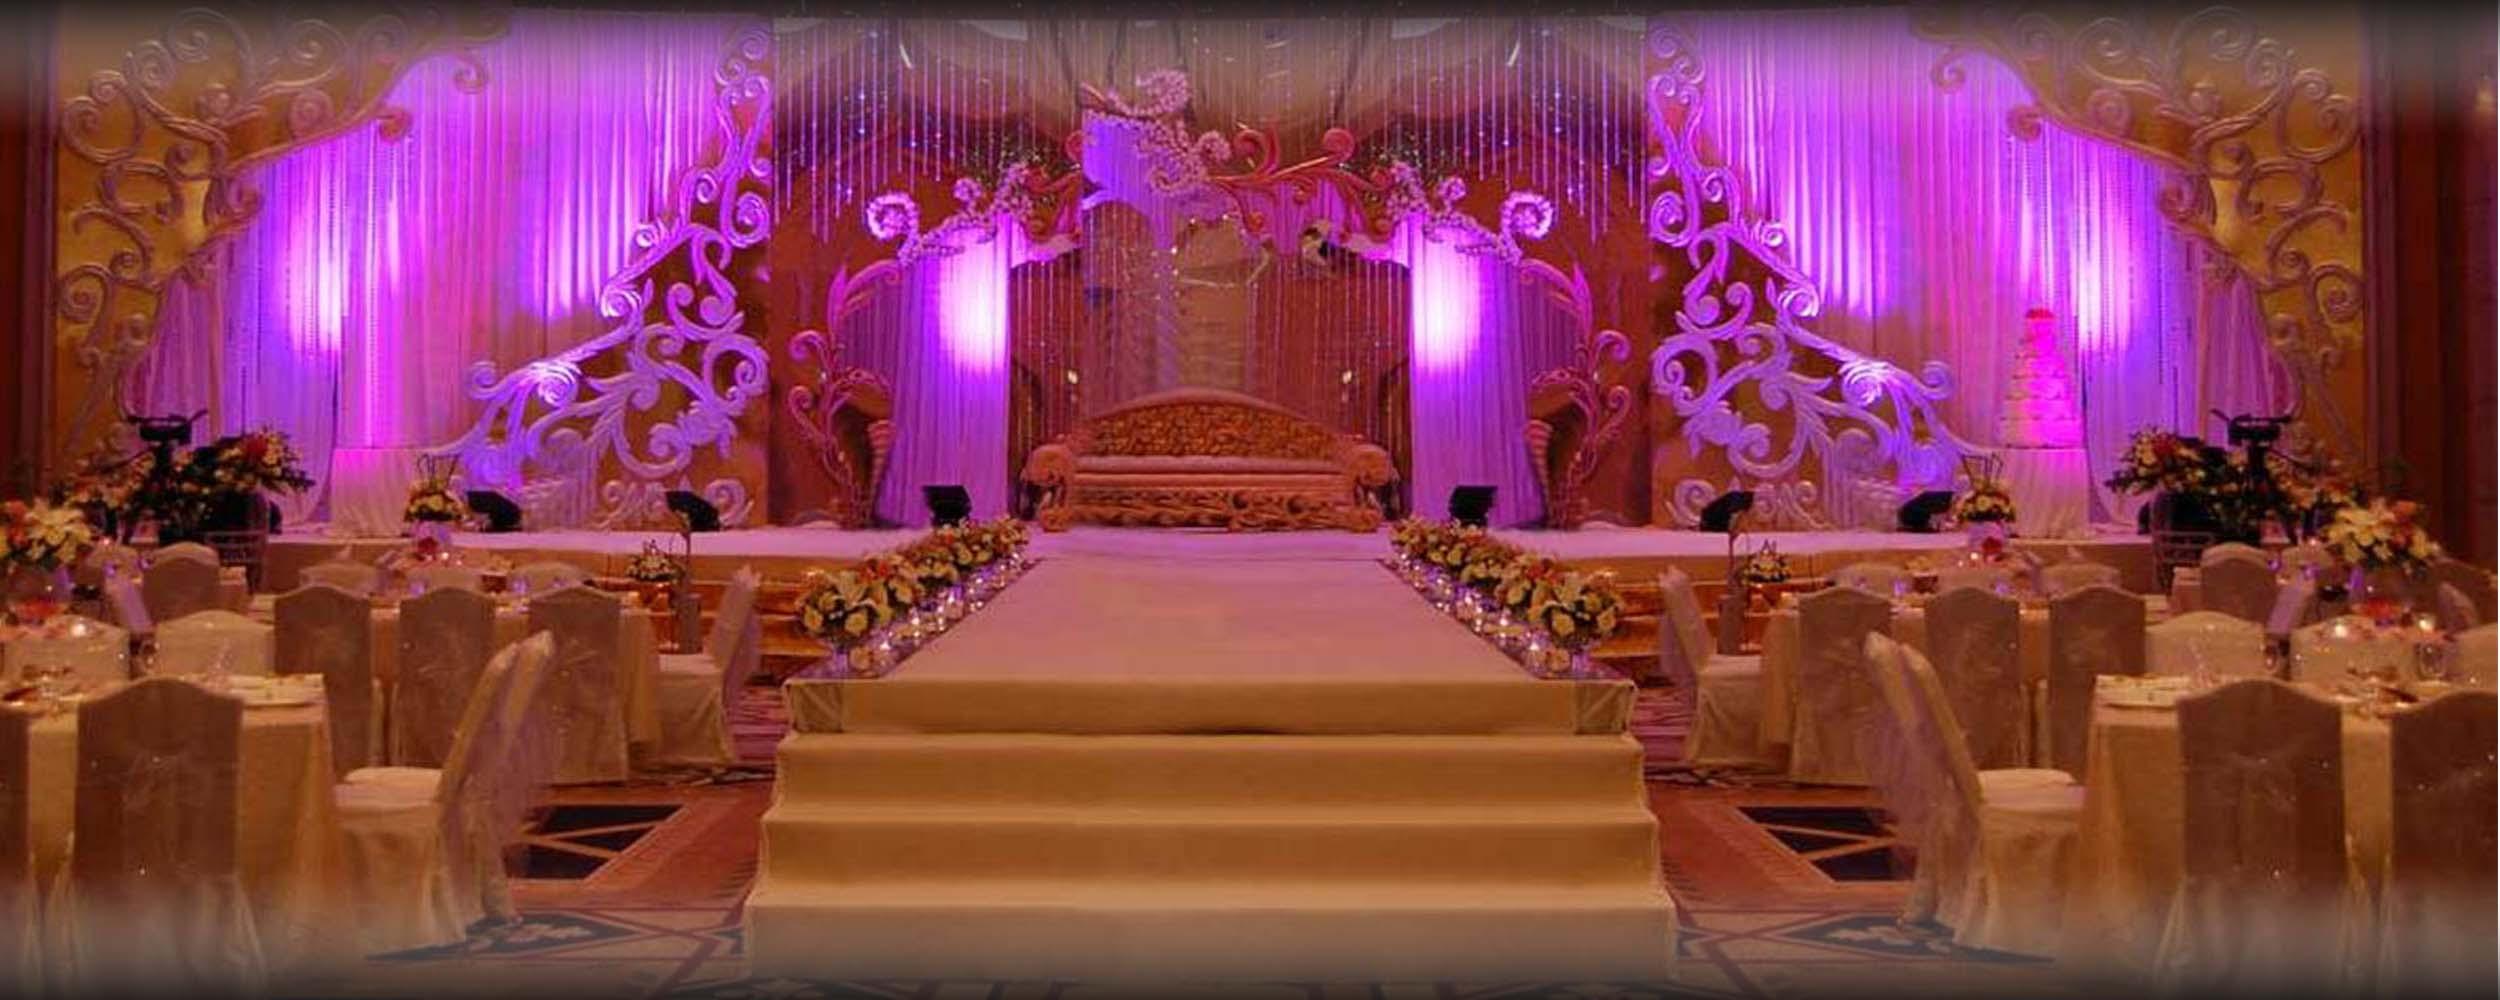 Stunning wedding venue in london asian wedding venues in for Asian wedding stage decoration london